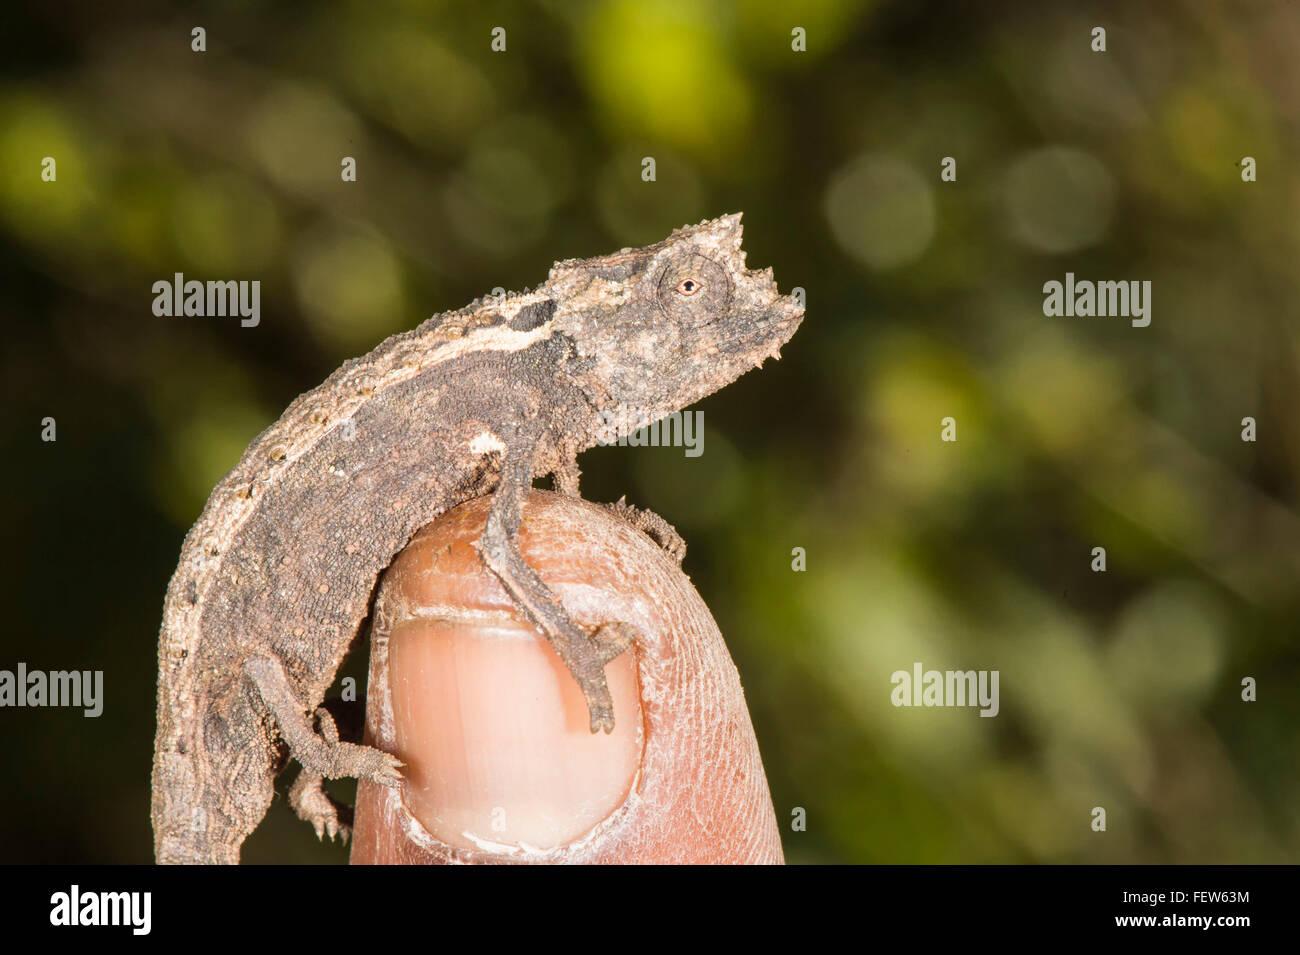 Dwarf Chameleon Stock Photos Dwarf Chameleon Stock Images Alamy